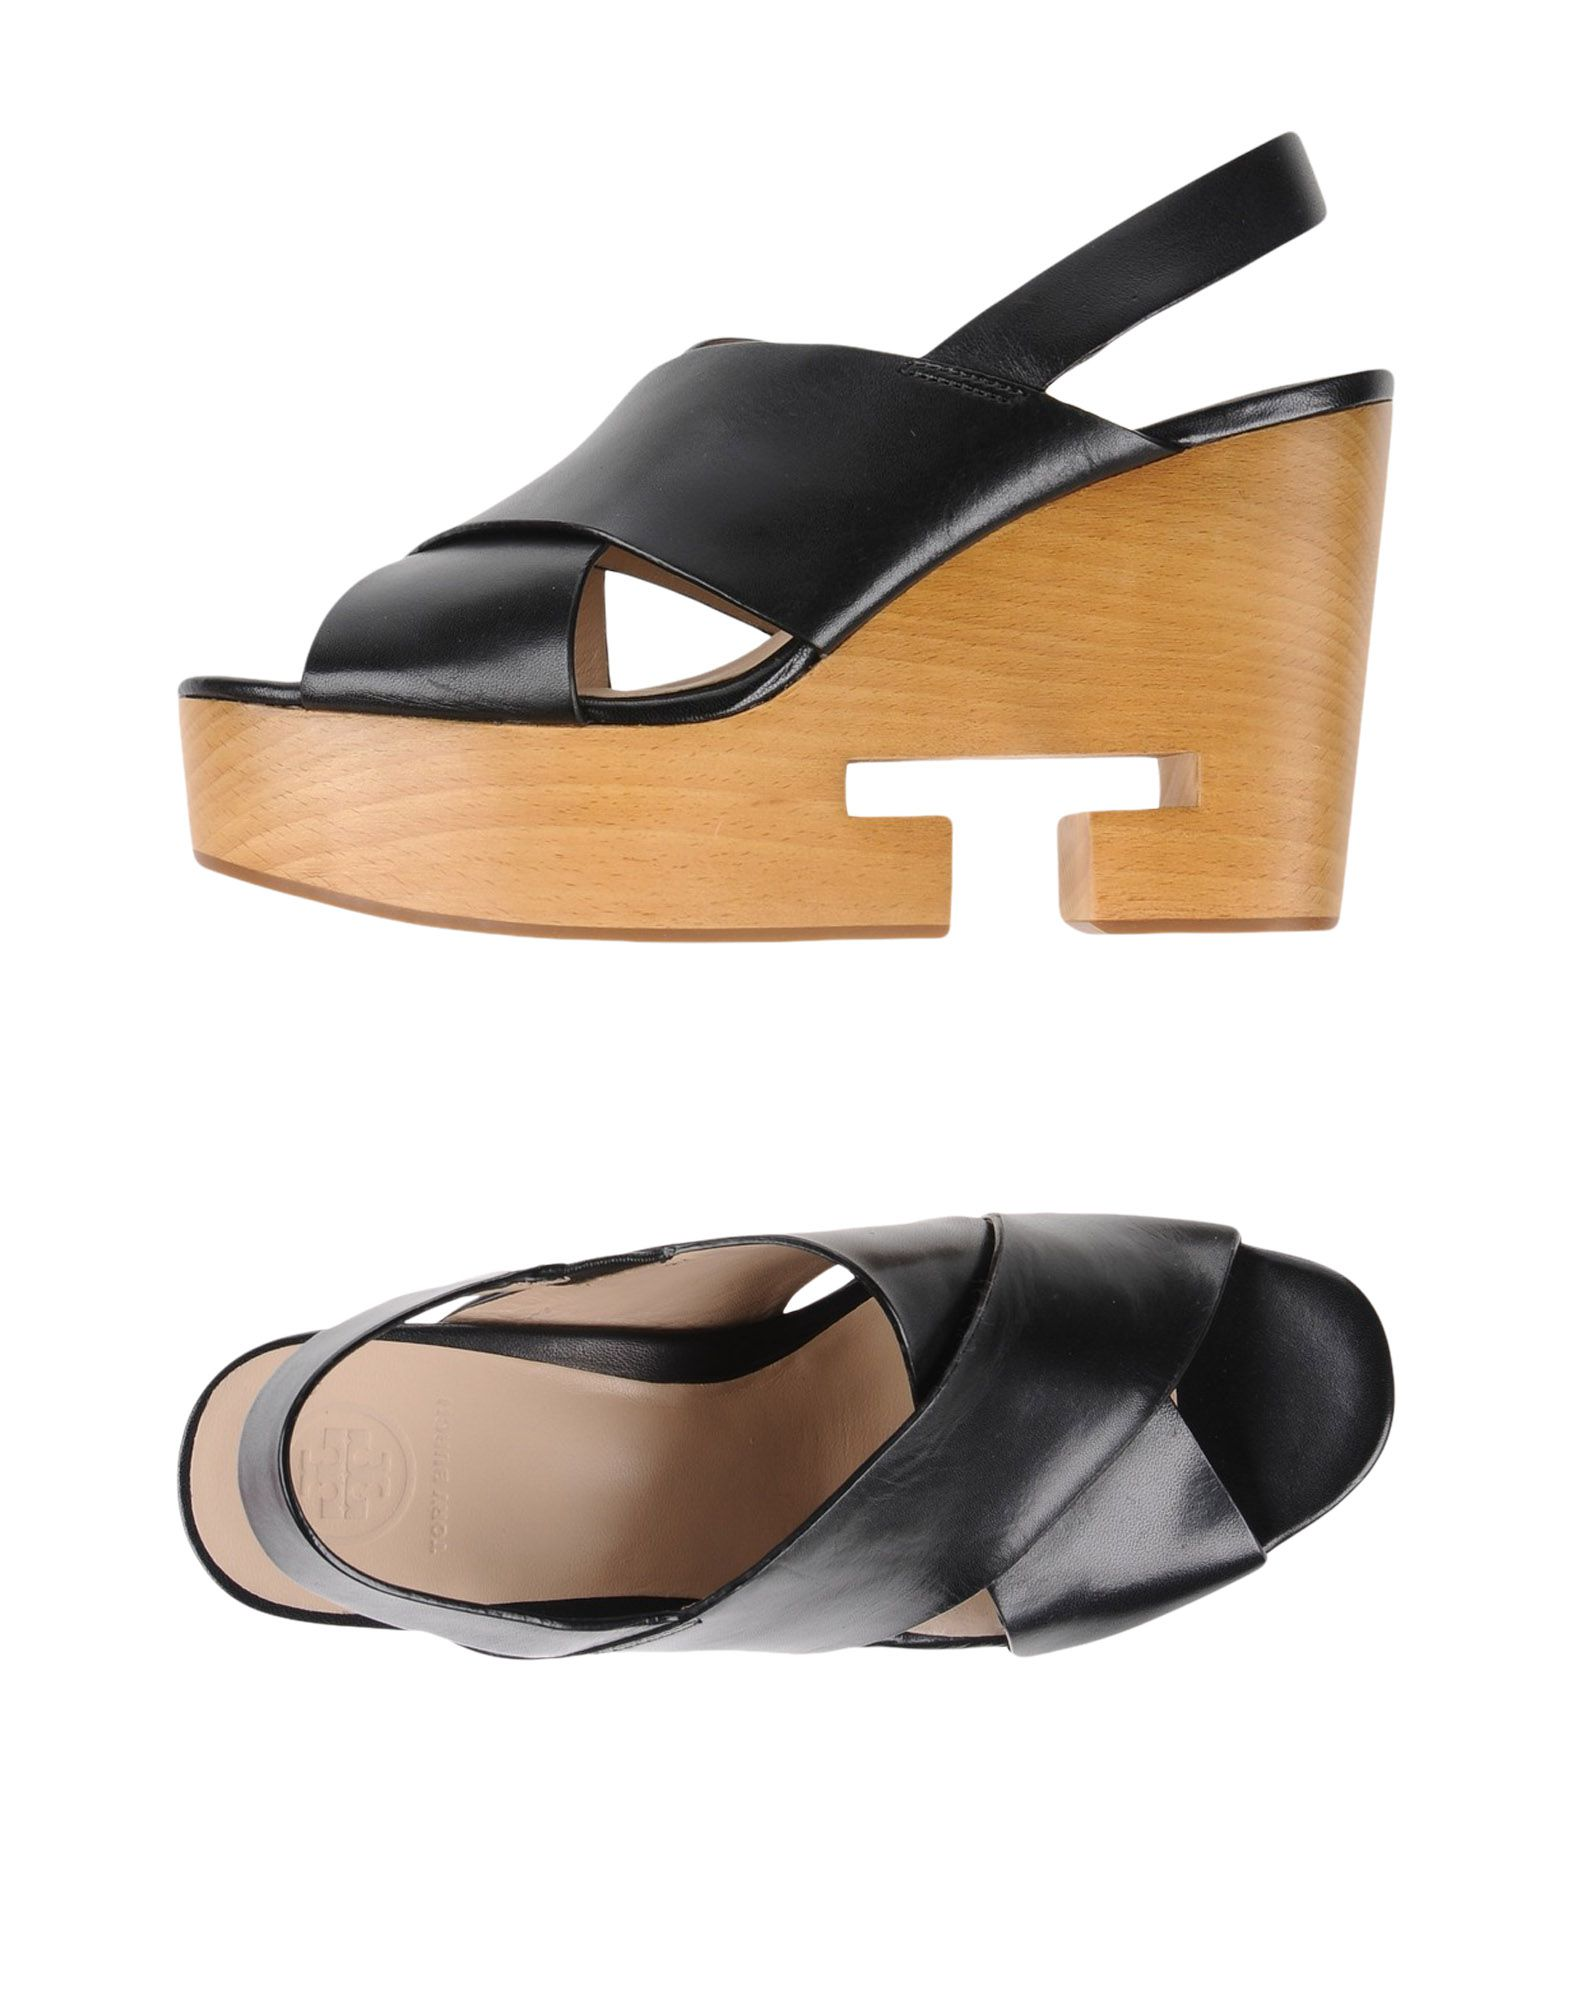 Stilvolle billige Schuhe Tory Burch Sandalen Damen  11207433TF